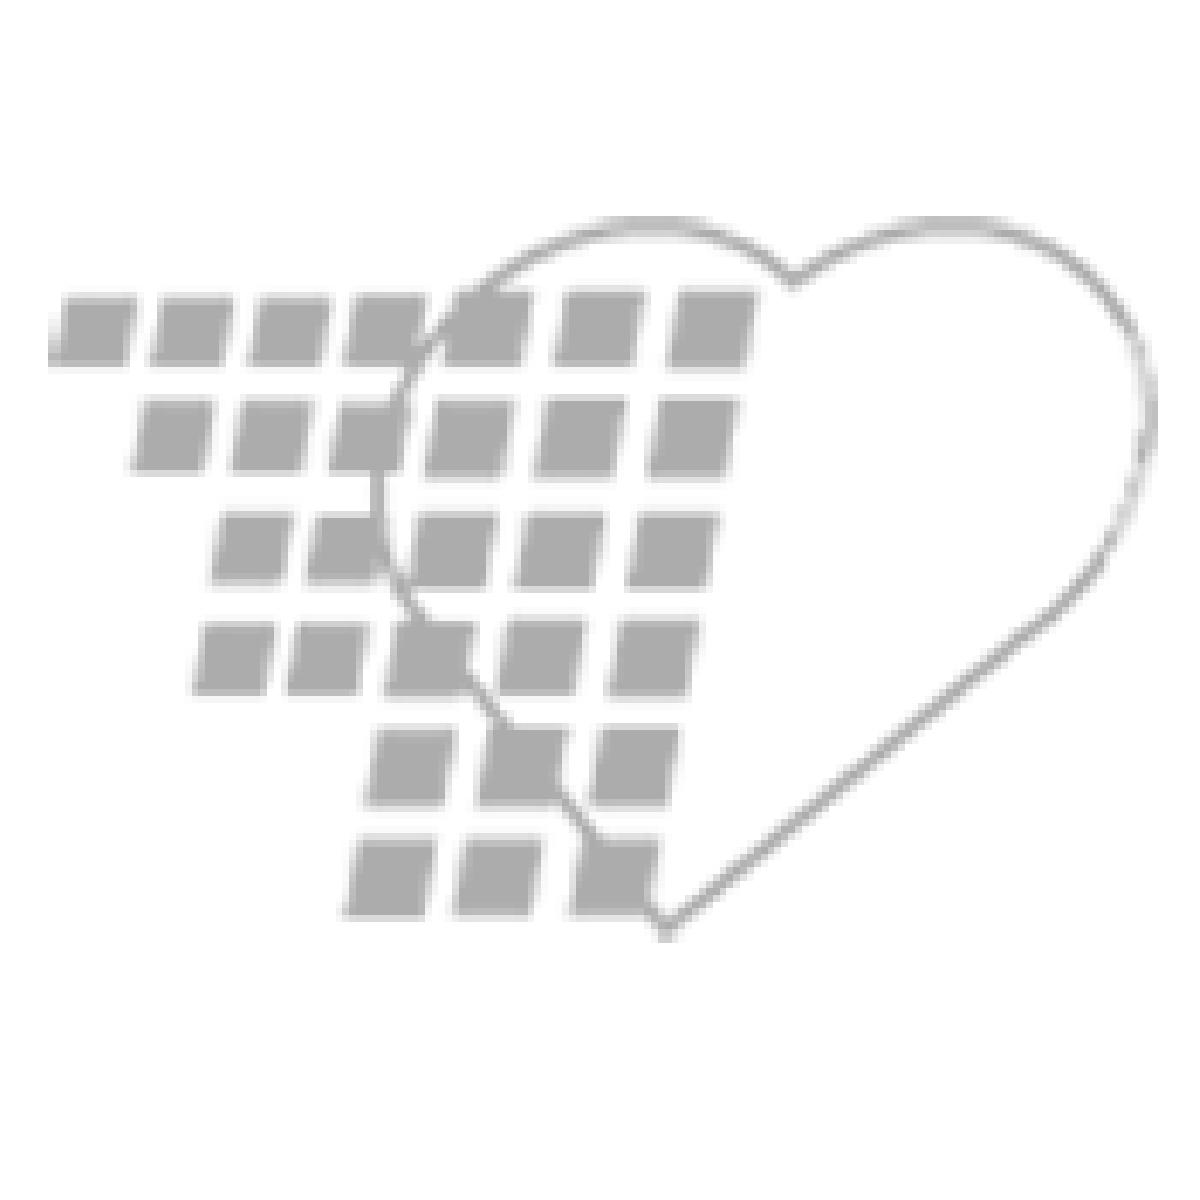 02-20-1441 - Riester Babyphon Pediatric Sphygmomanometer Set